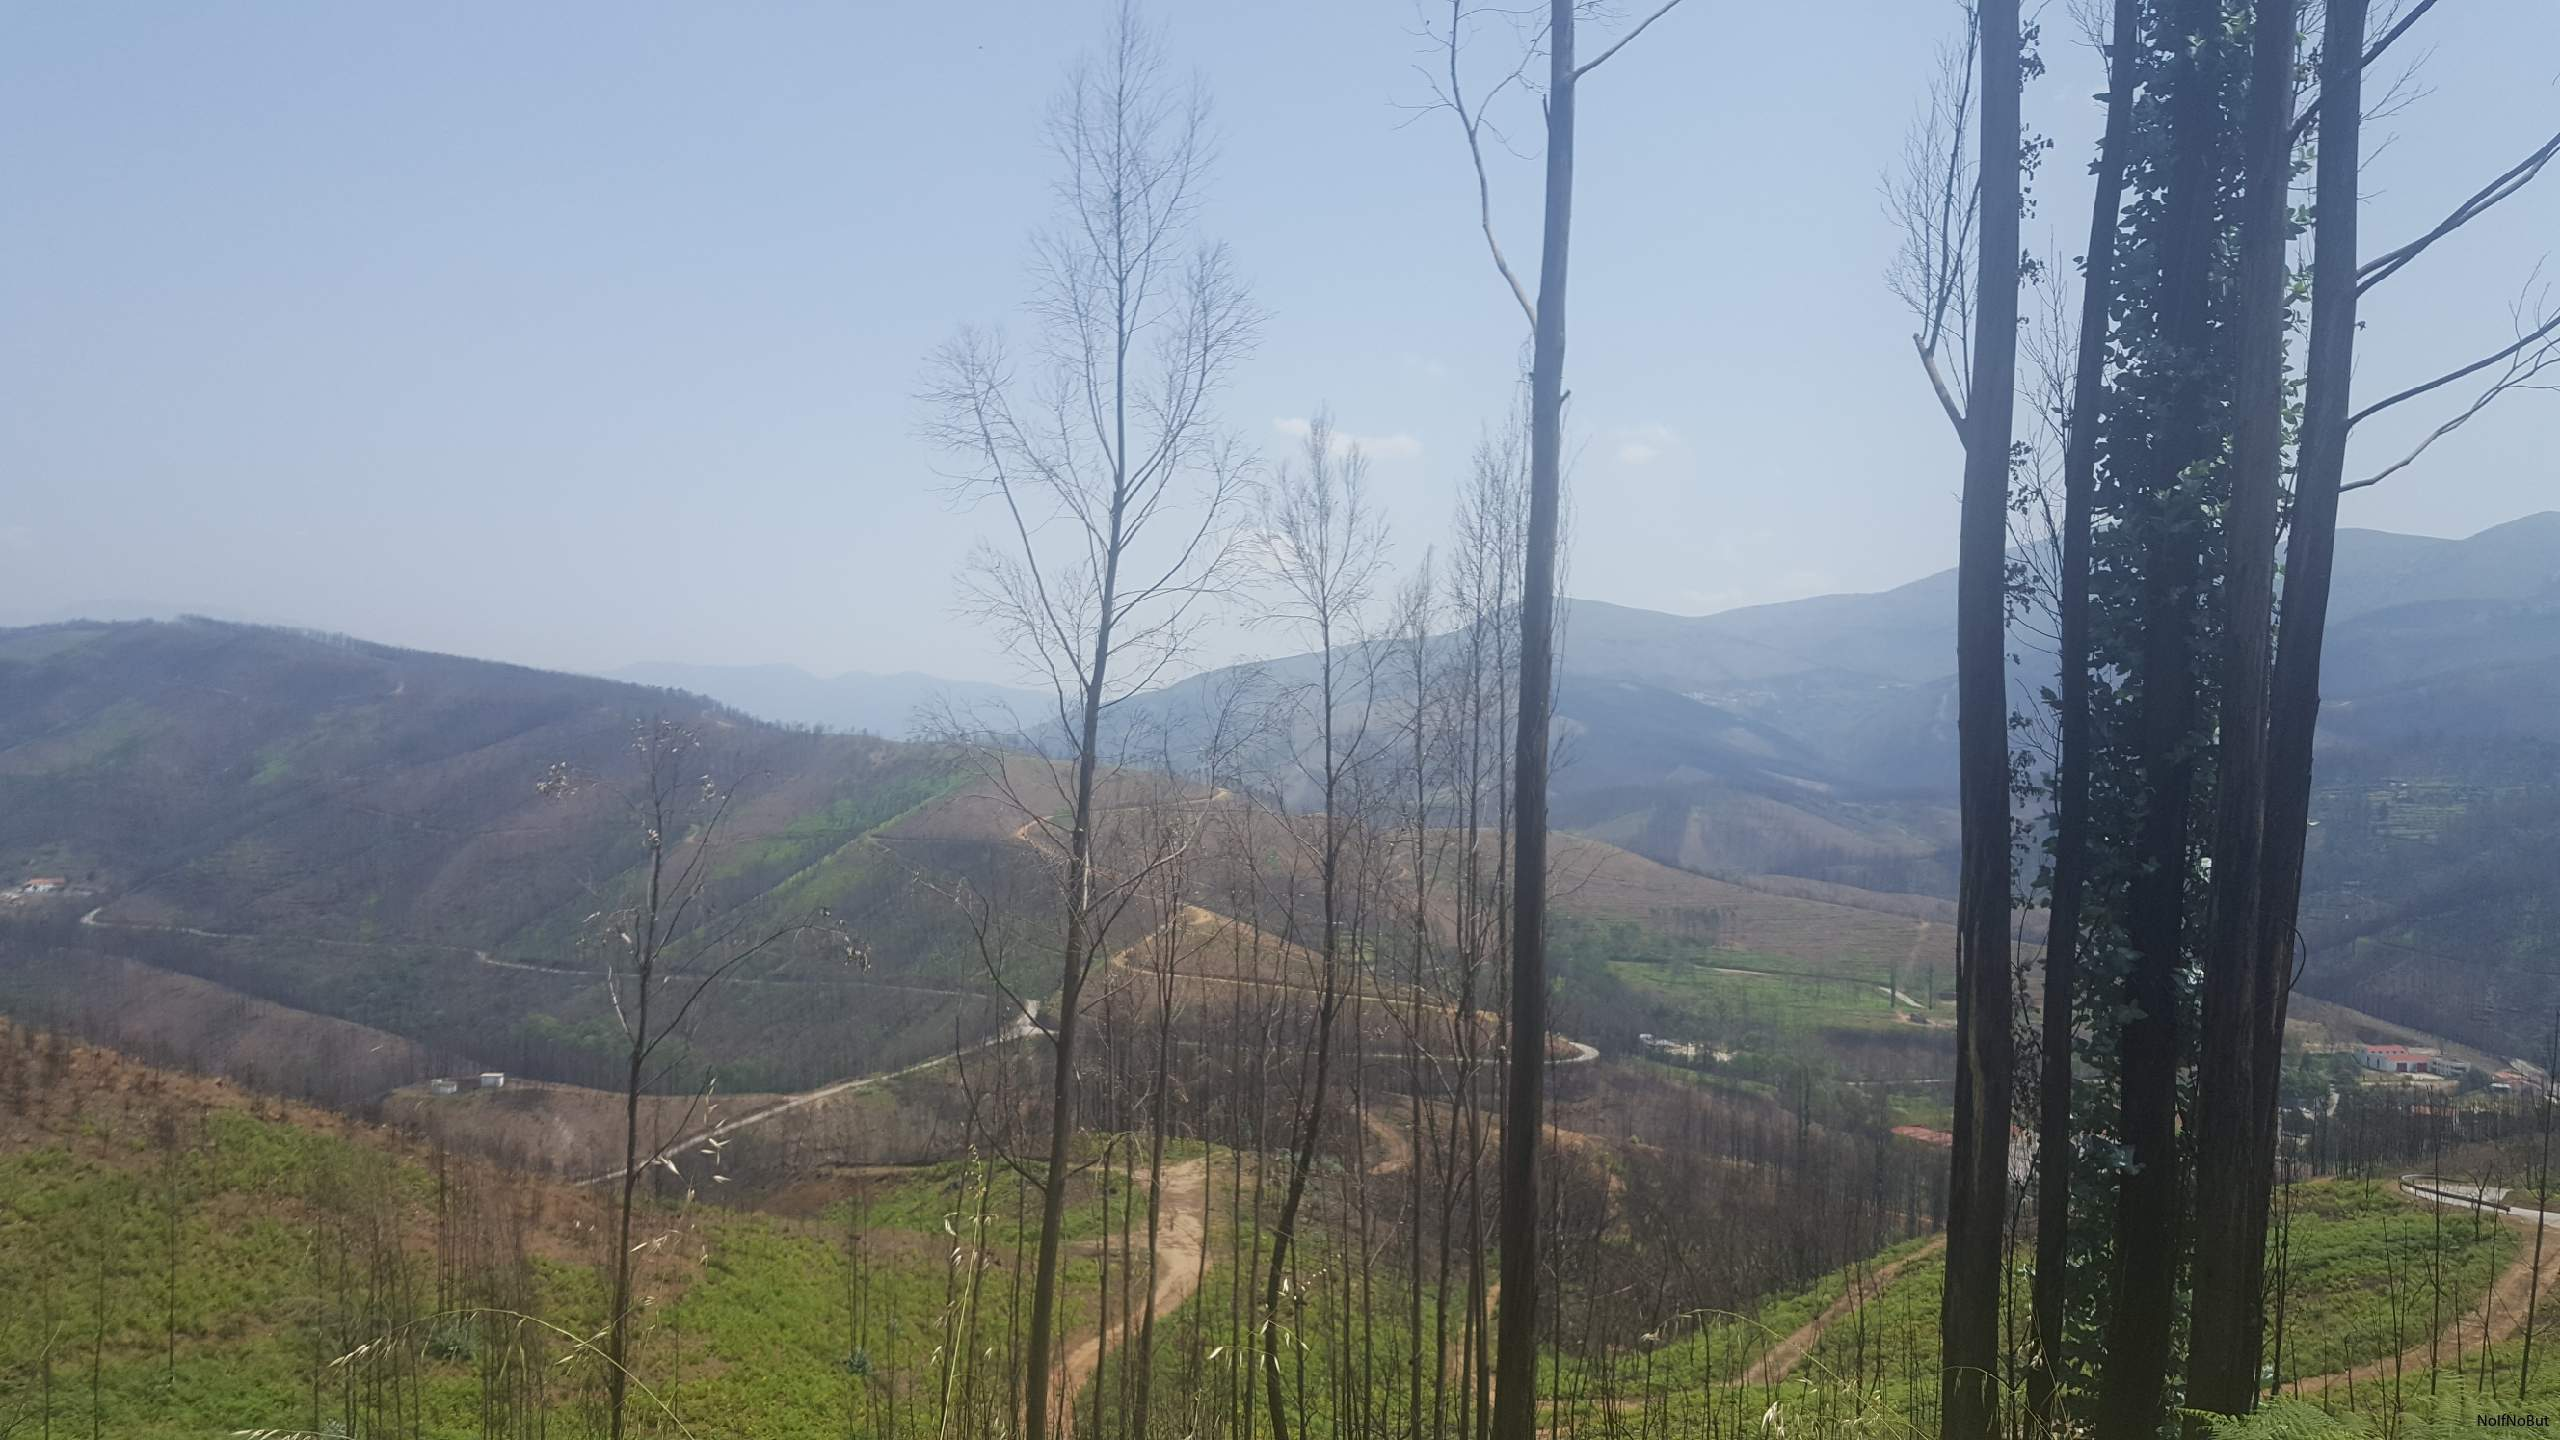 hastighet dating i skog kullar ca